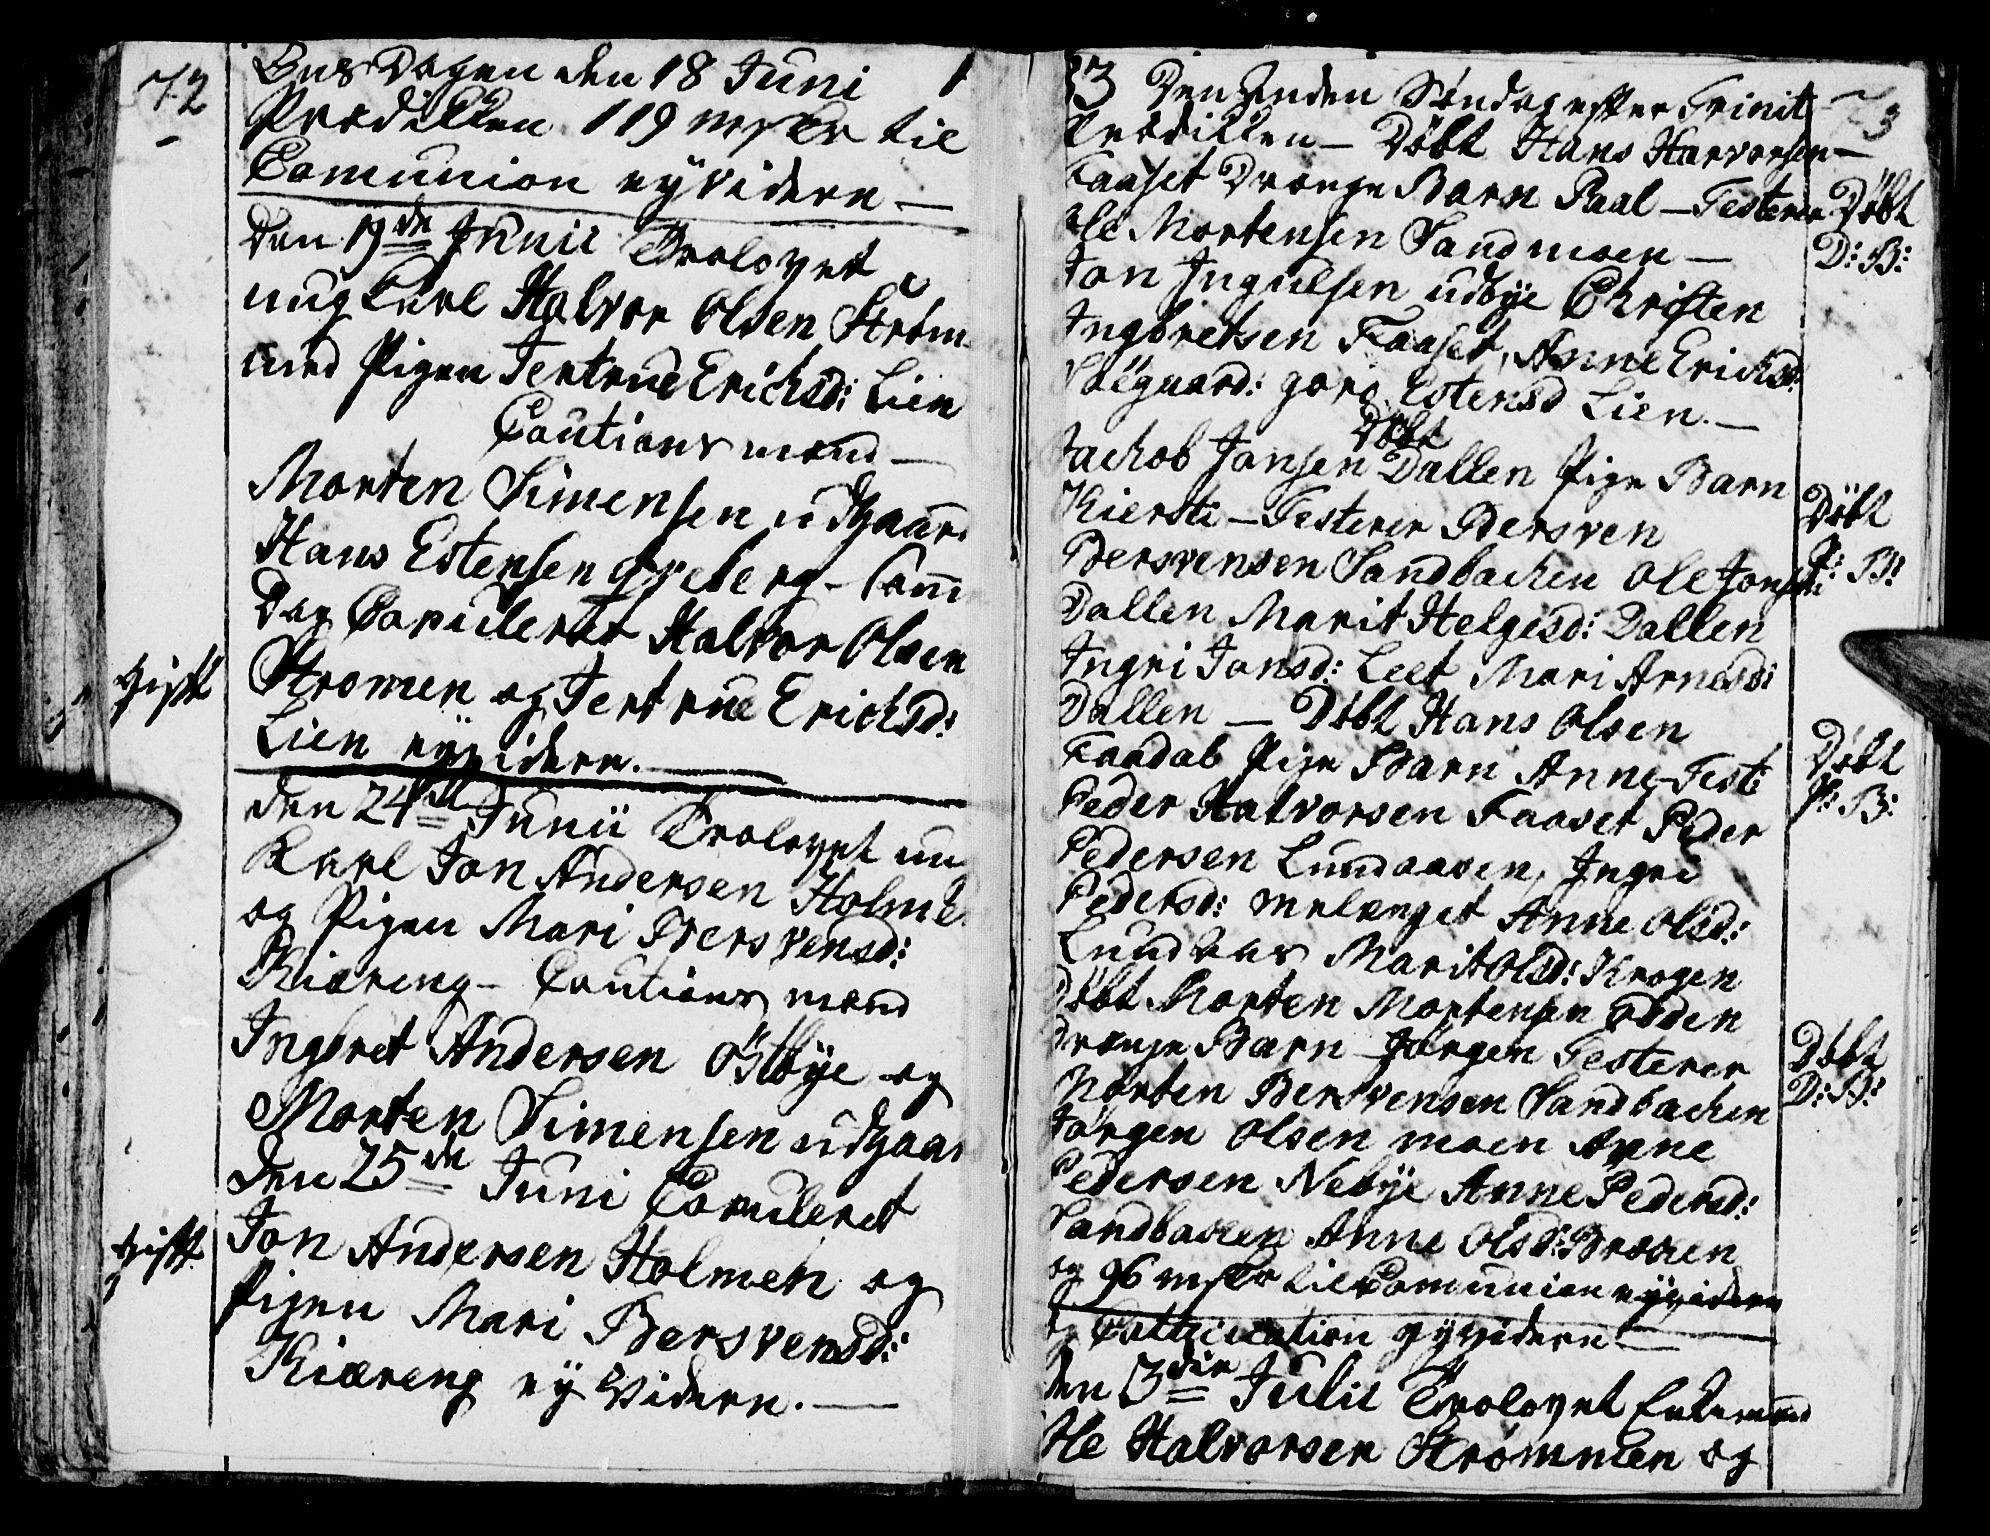 SAH, Tynset prestekontor, Ministerialbok nr. 12, 1780-1784, s. 72-73